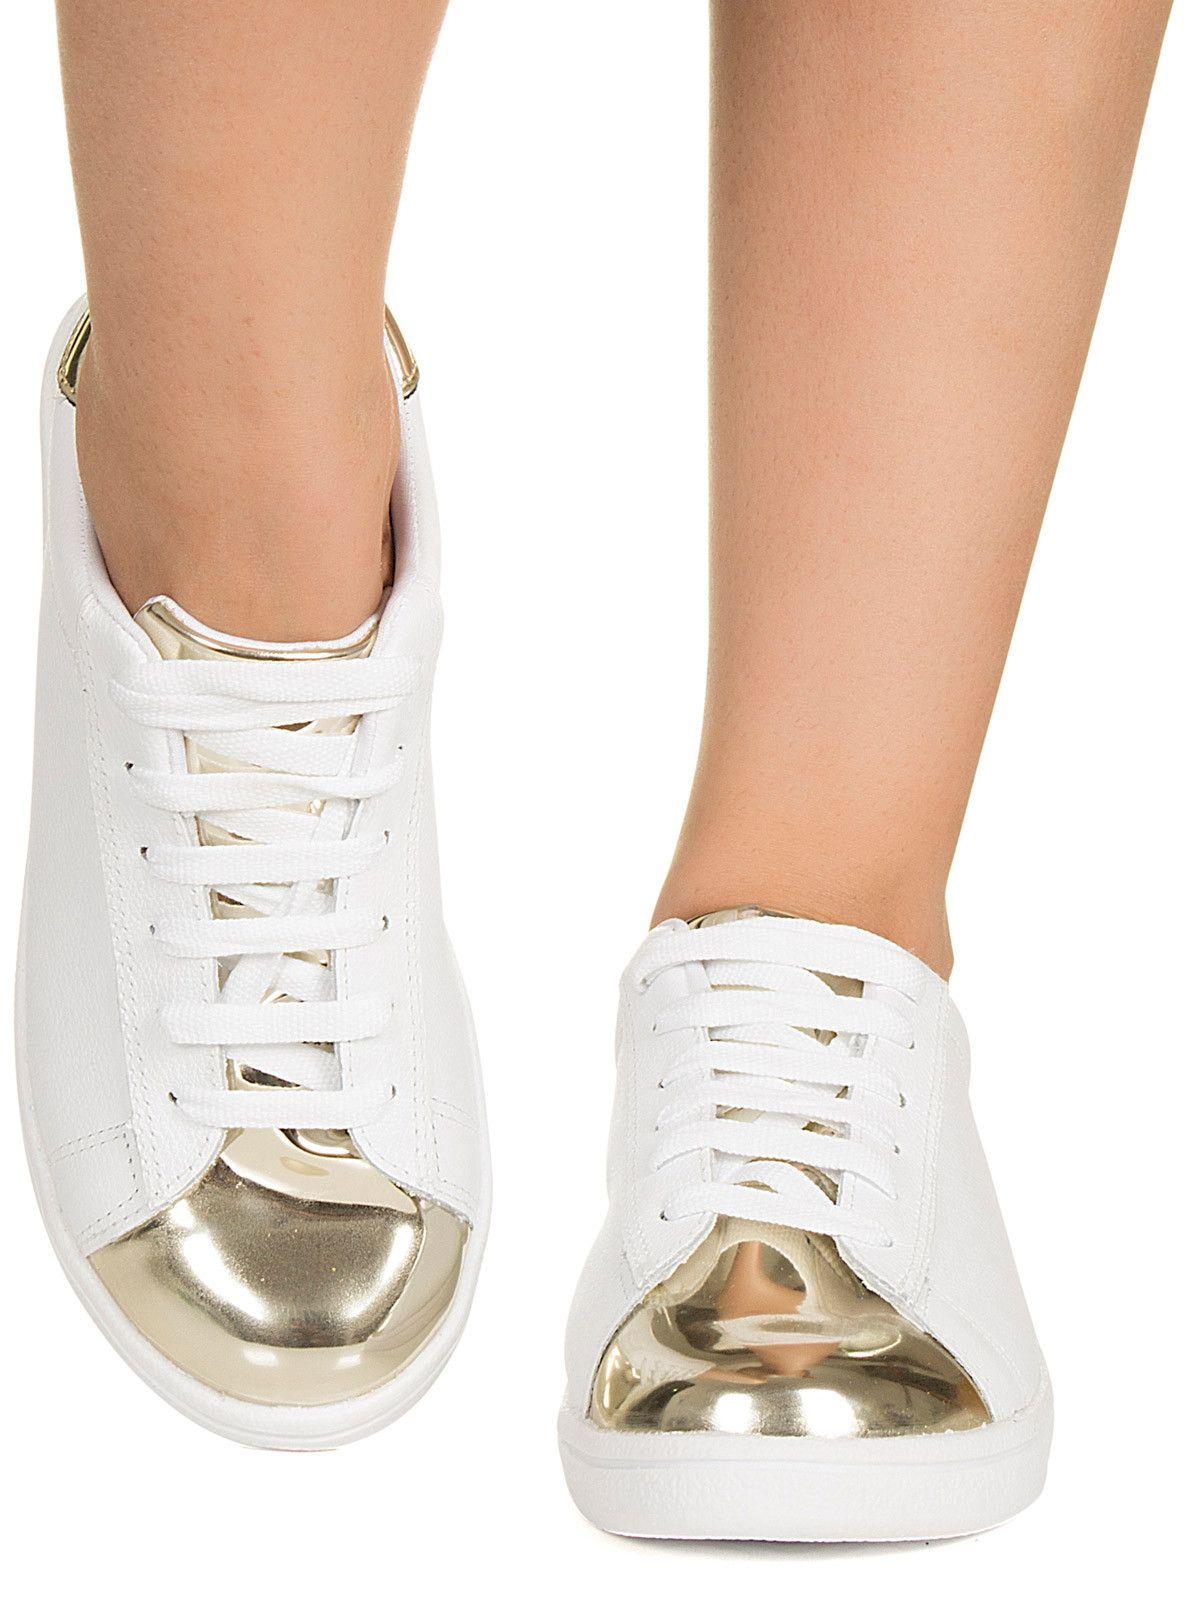 0692378613 Tênis branco e dourado Taquilla - Taquilla - Loja online de sapatos  femininos